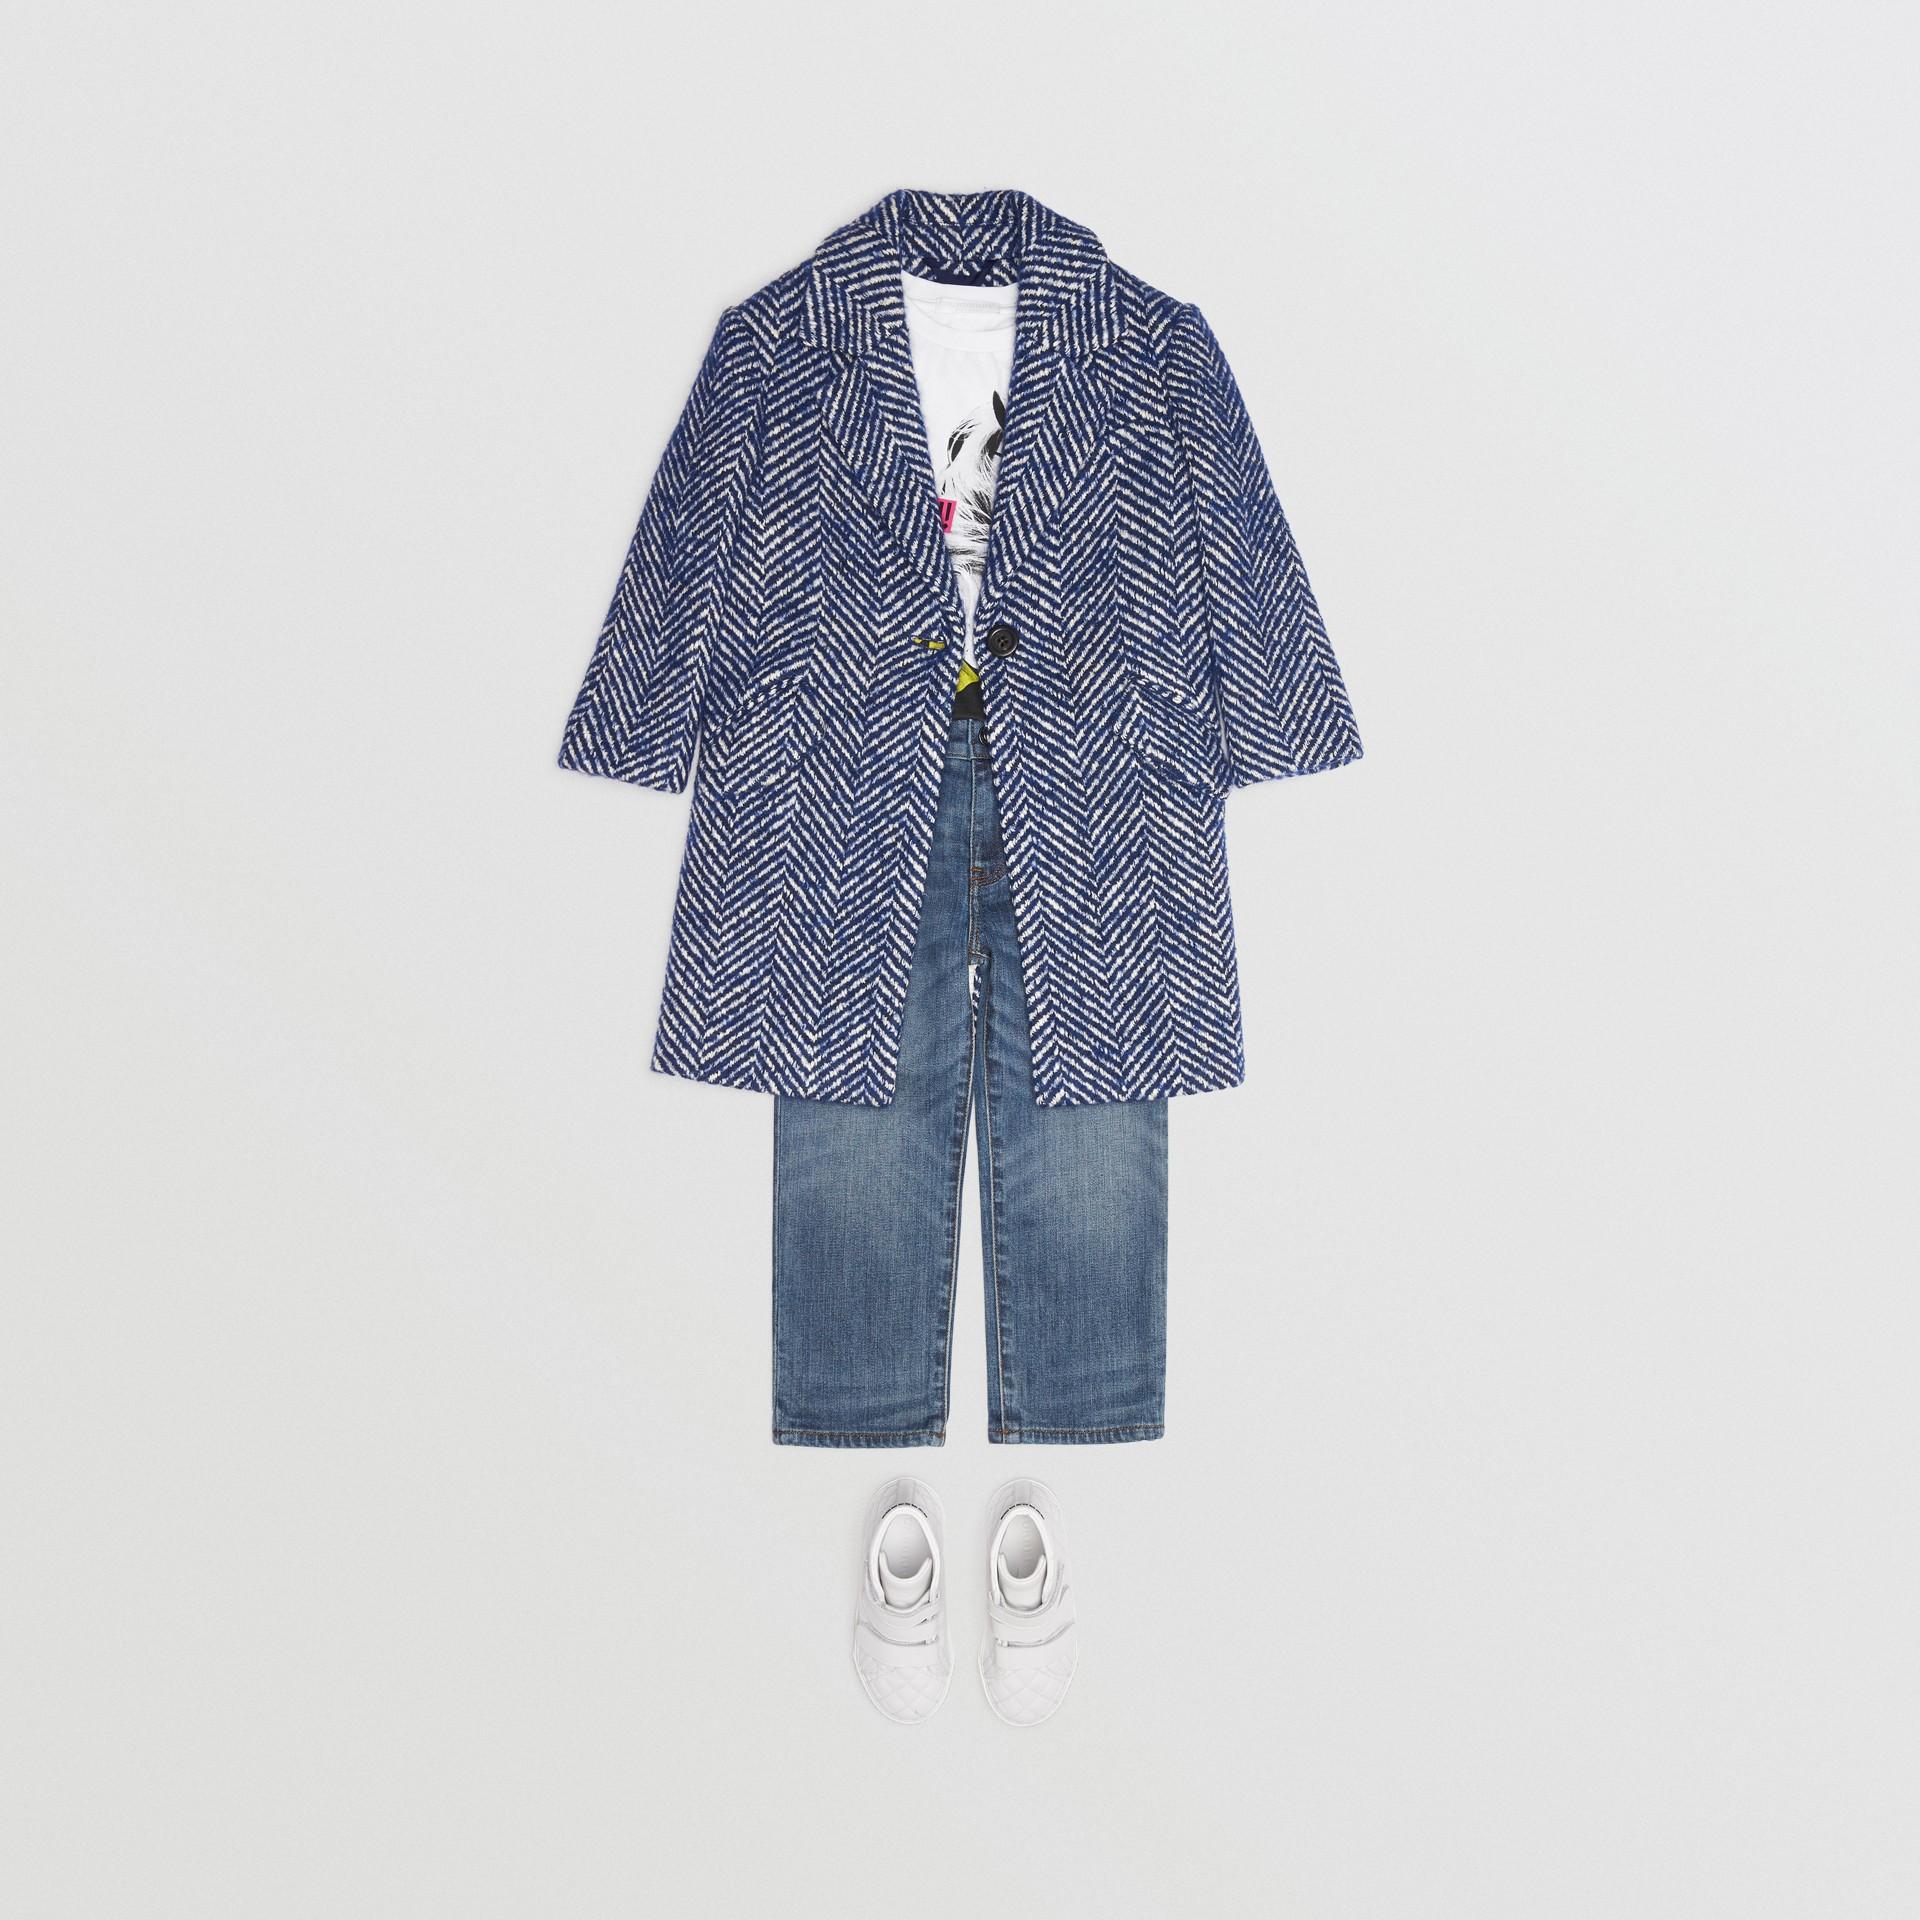 Herringbone Wool Cotton Blend Tailored Coat in Navy - Children | Burberry - gallery image 2